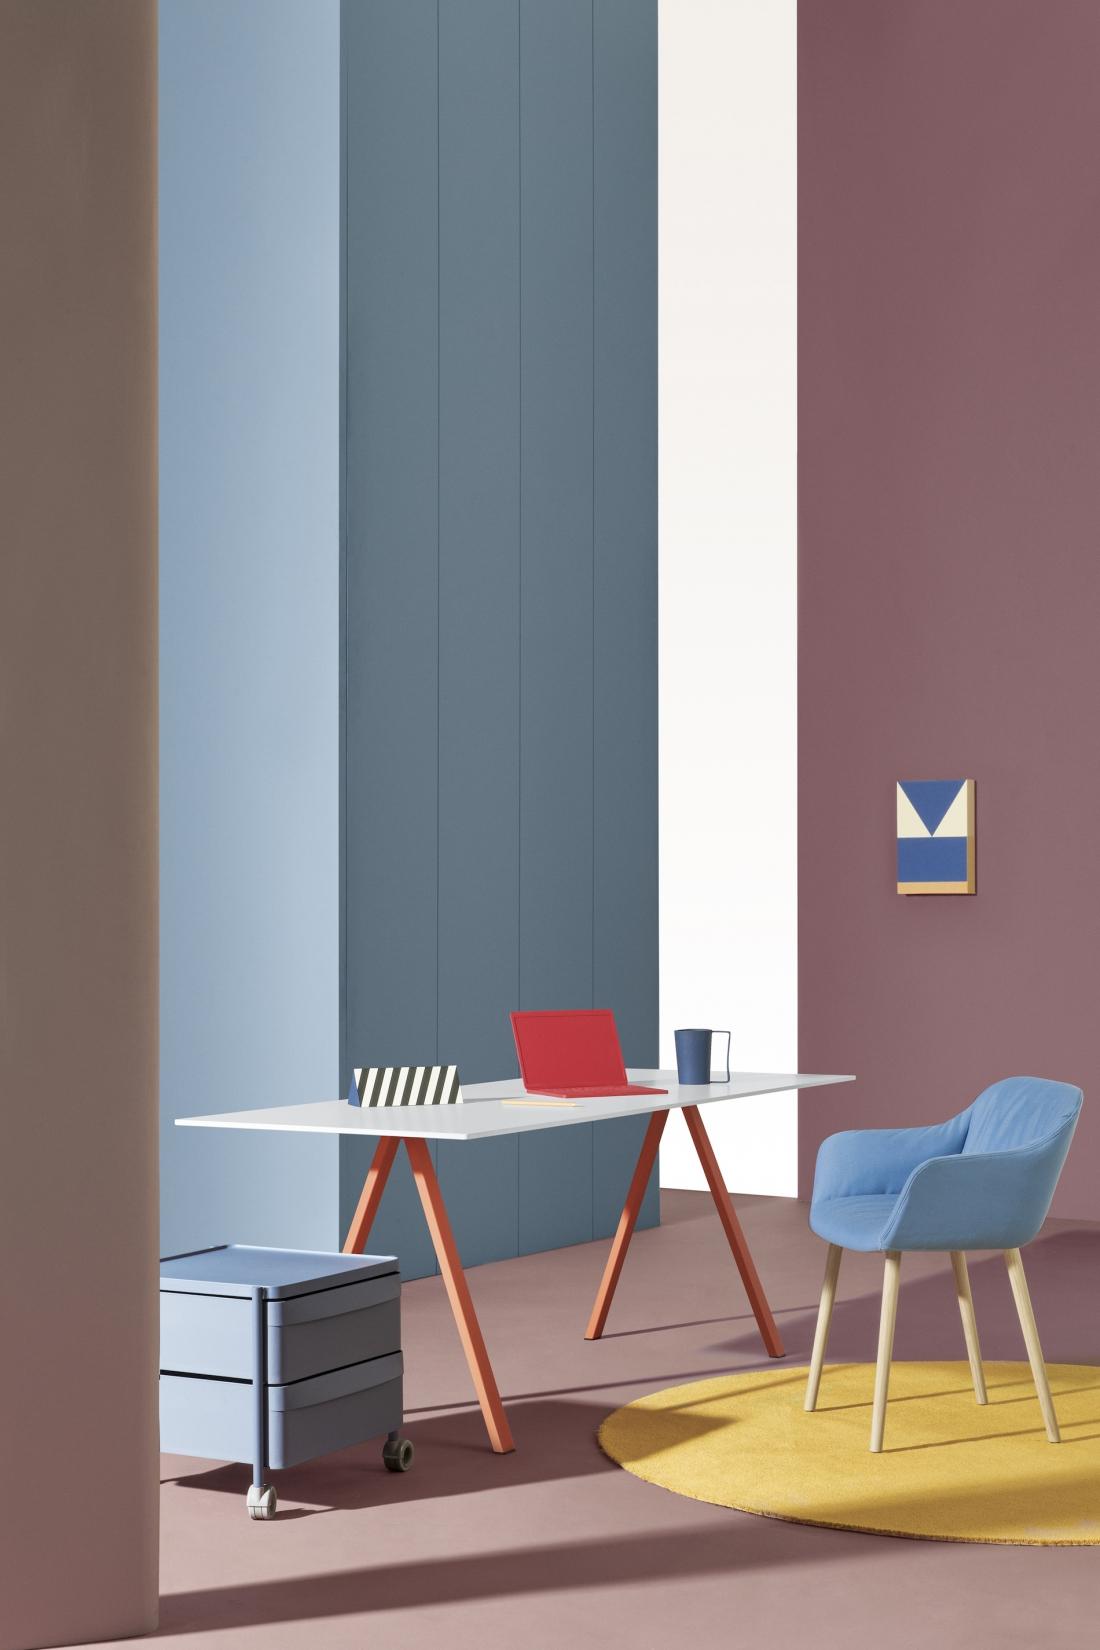 Pedrali, Arki-Desk, art direction: Studio FM, photo: Andrea Garuti